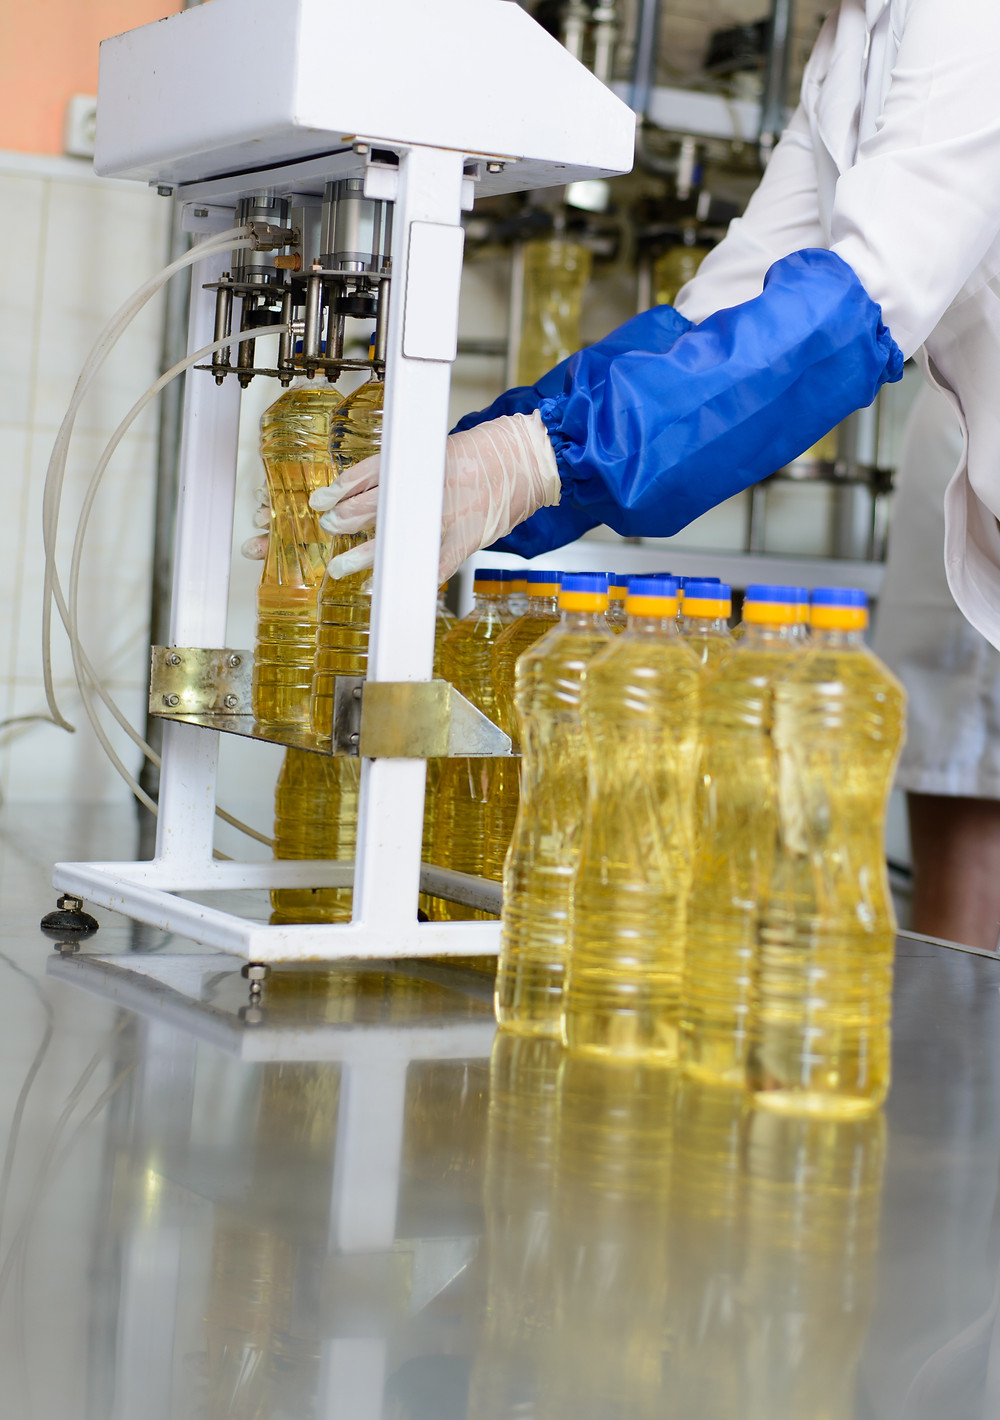 Sonnenblumenöl wird als natives Olivenöl extra verkauft evoo.expert